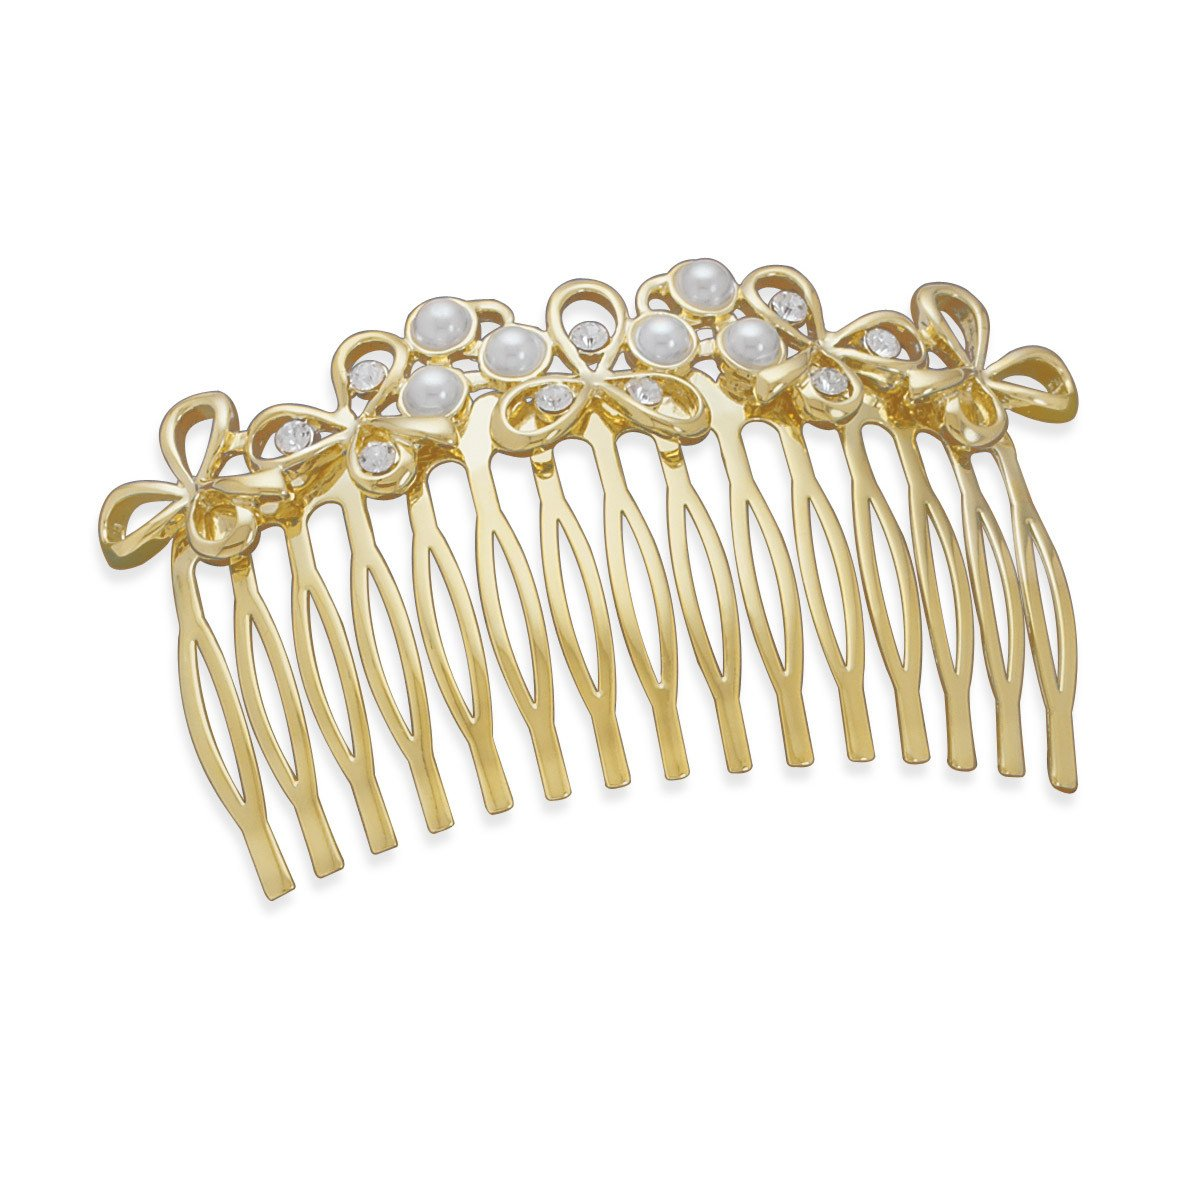 3″ Multistone 14 Karat Gold Plated Fashion Hair Comb